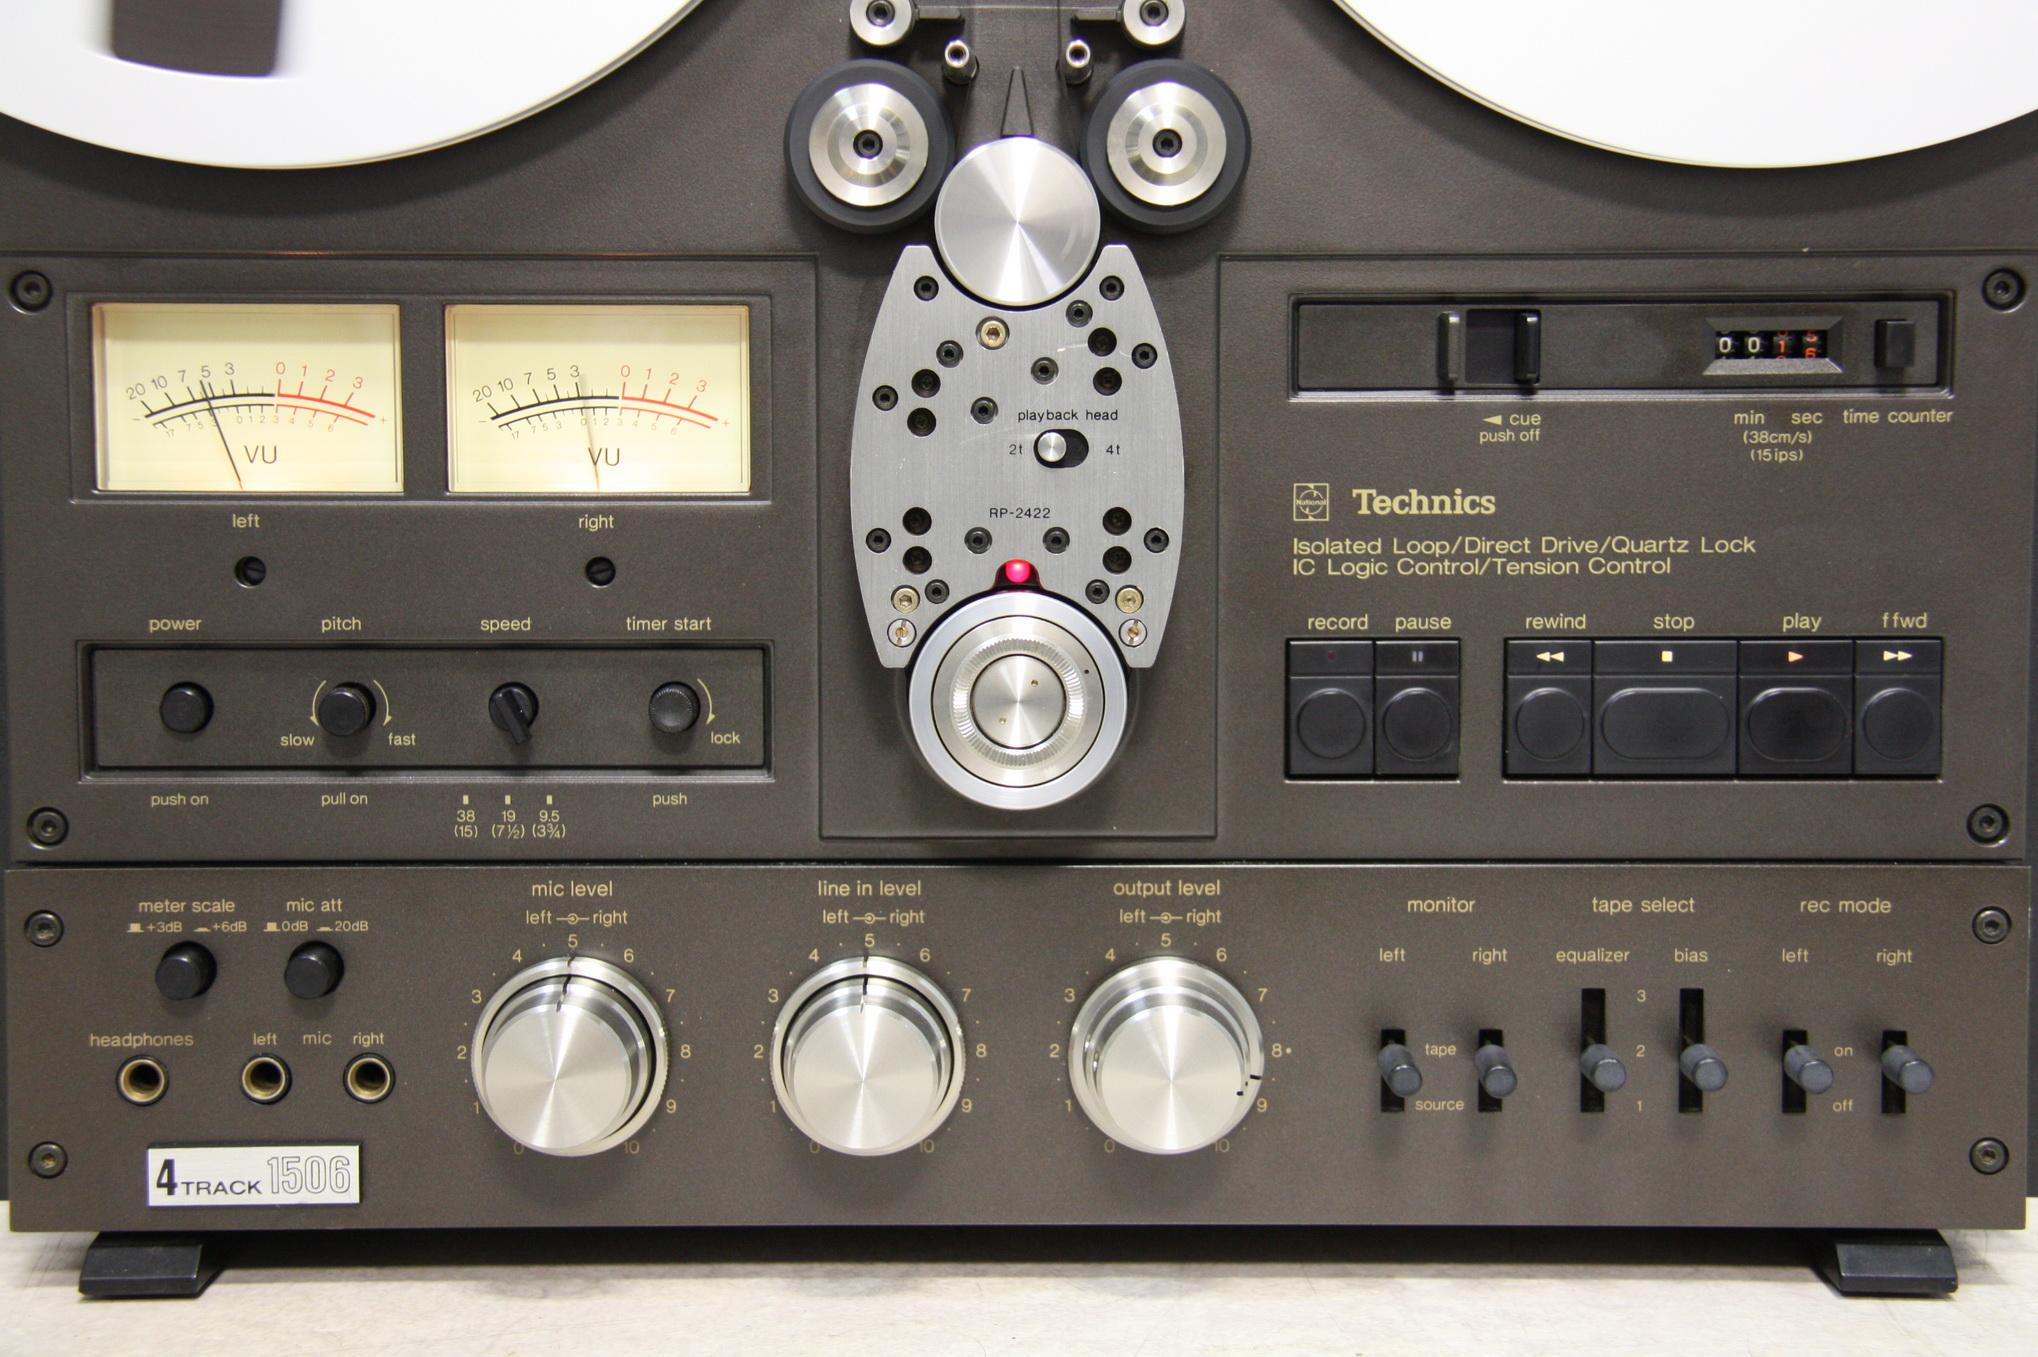 die r hre frankfurt technics rs 1506 profi klasse bandmaschine vintage hifi high end neu. Black Bedroom Furniture Sets. Home Design Ideas